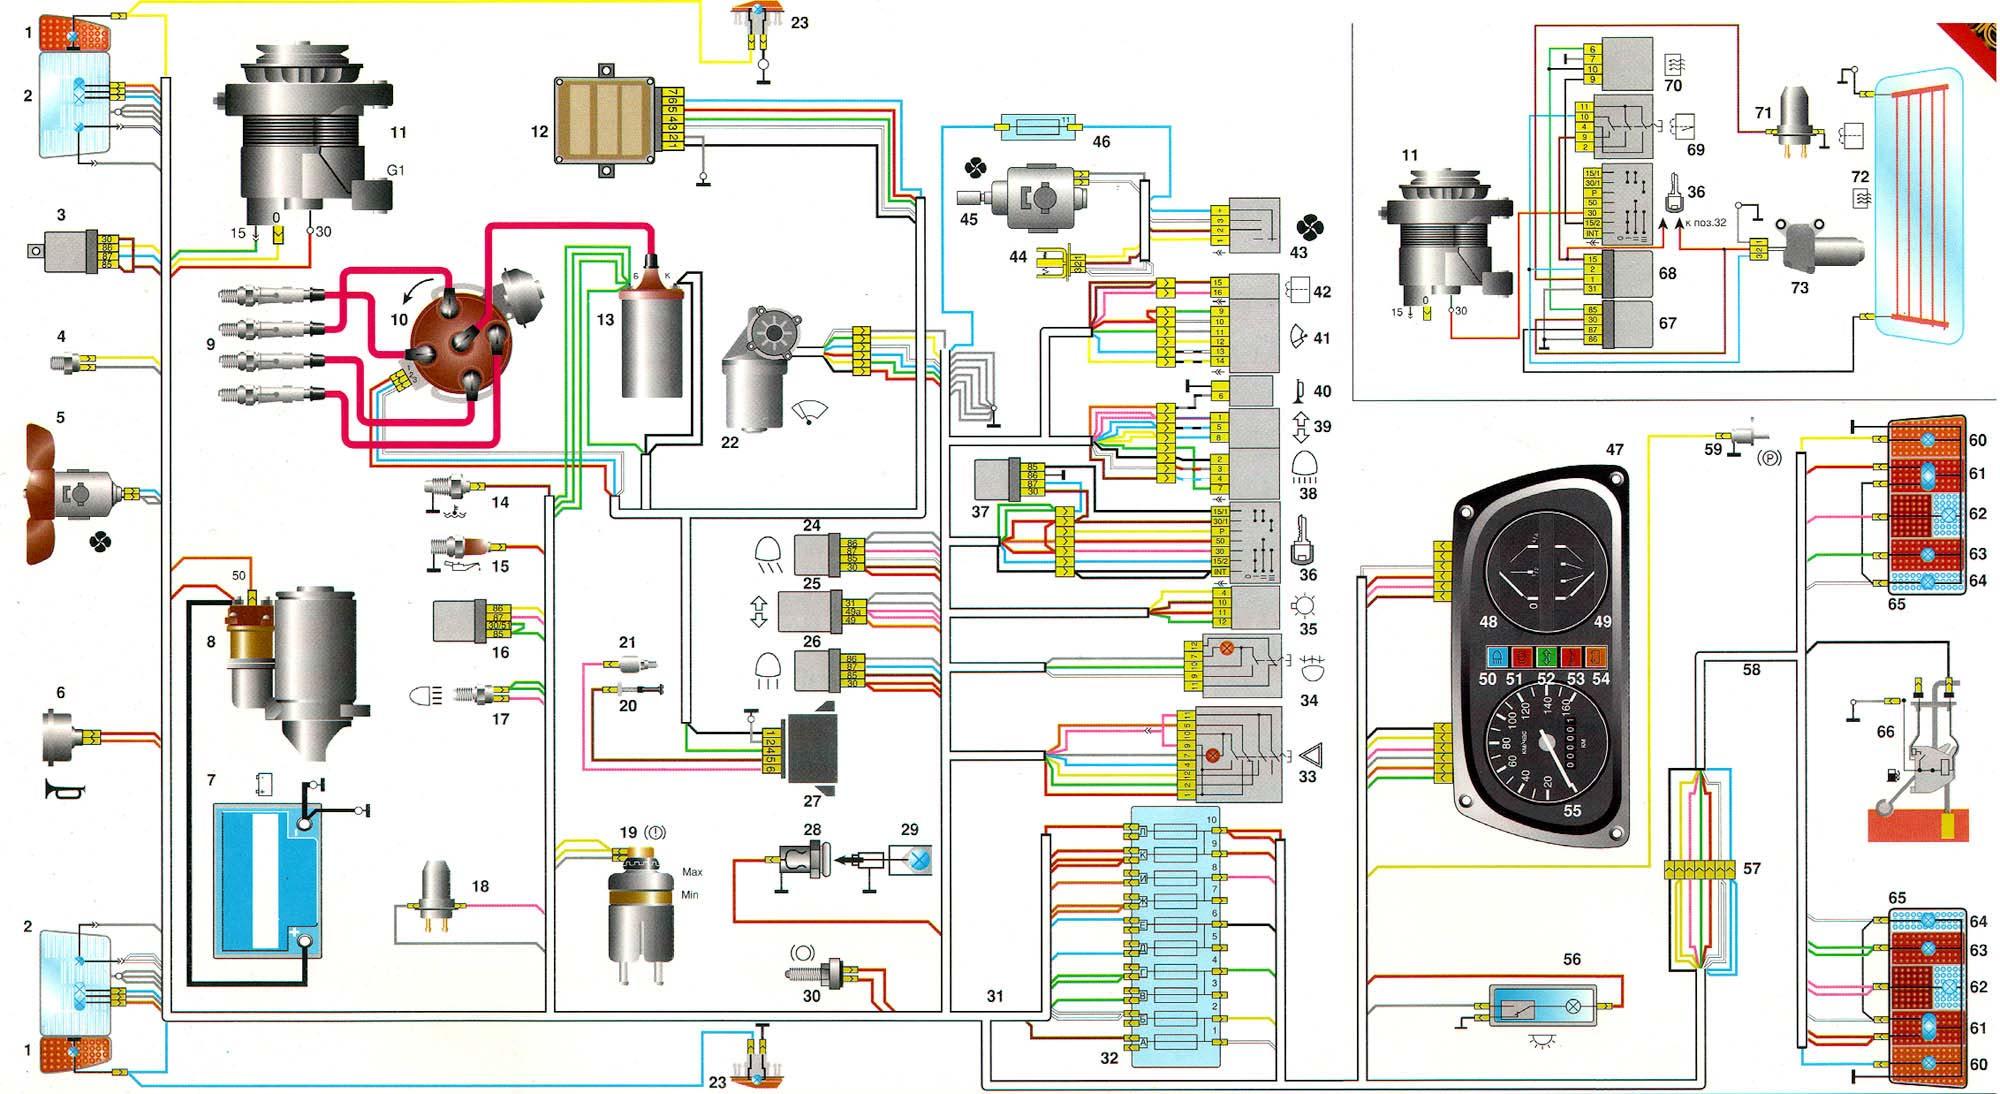 Схема электрооборудования автомобиля заз 110206 таврия shematic